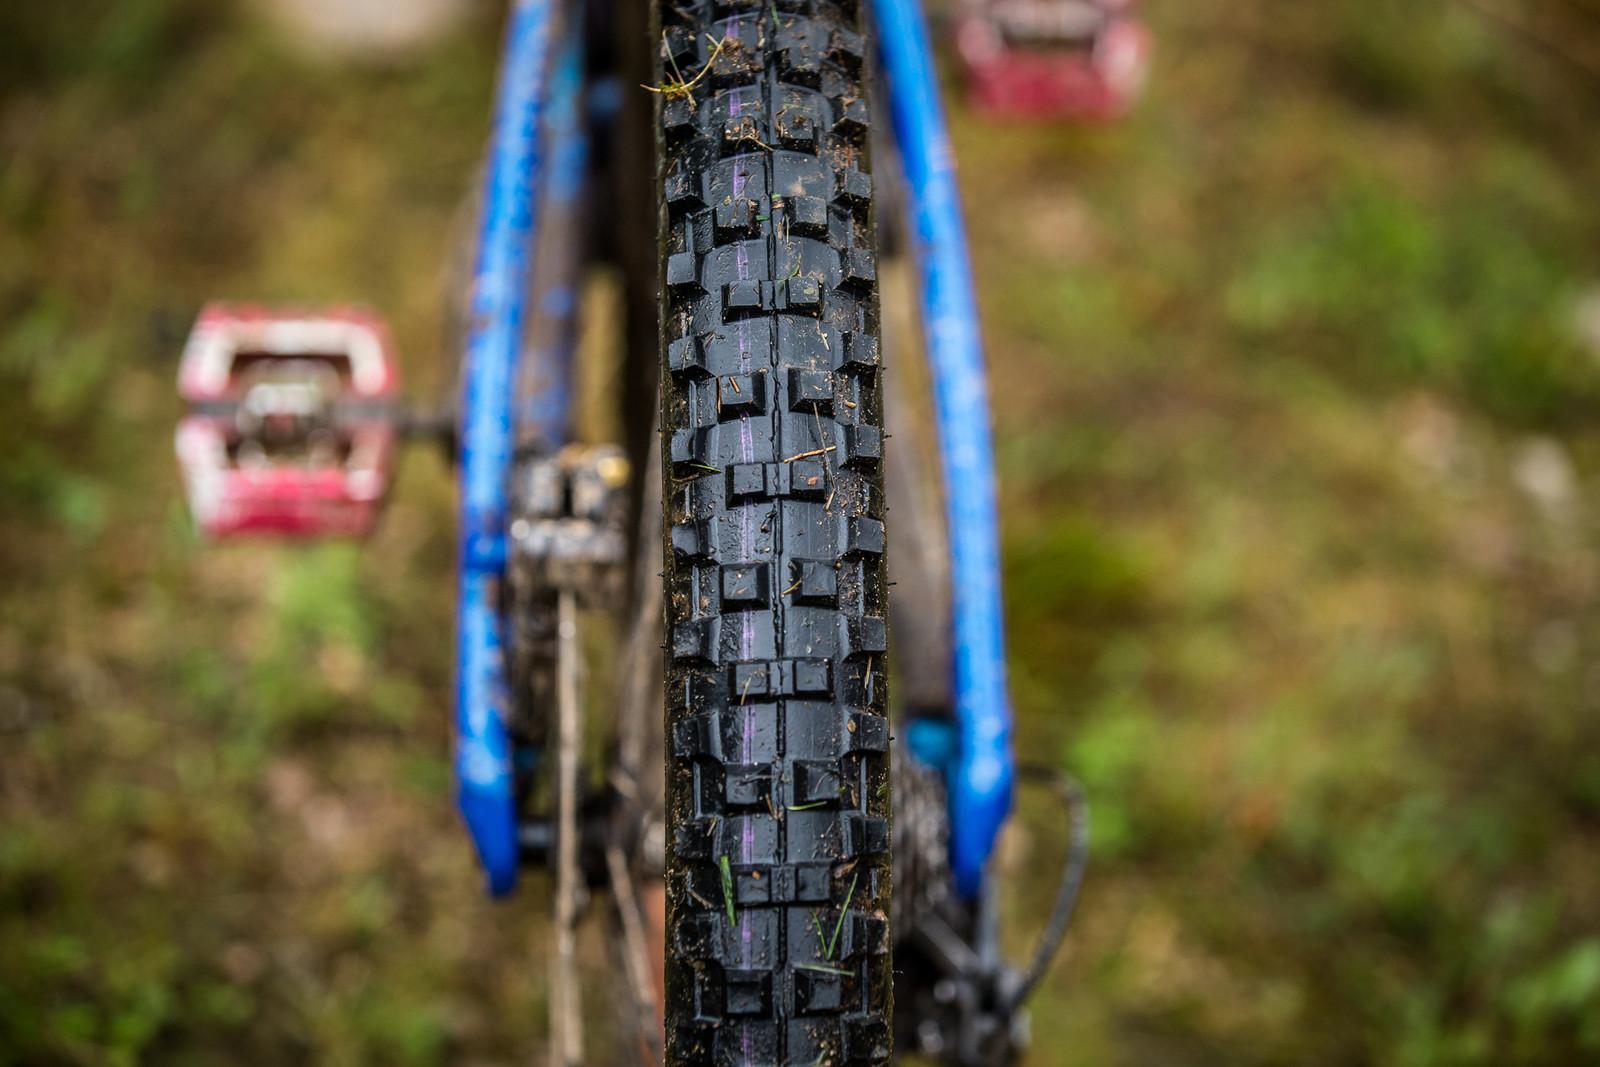 Cut Schwalbe Dirty Dan - WINNING BIKE - Martin Maes' GT Fury - Mountain Biking Pictures - Vital MTB